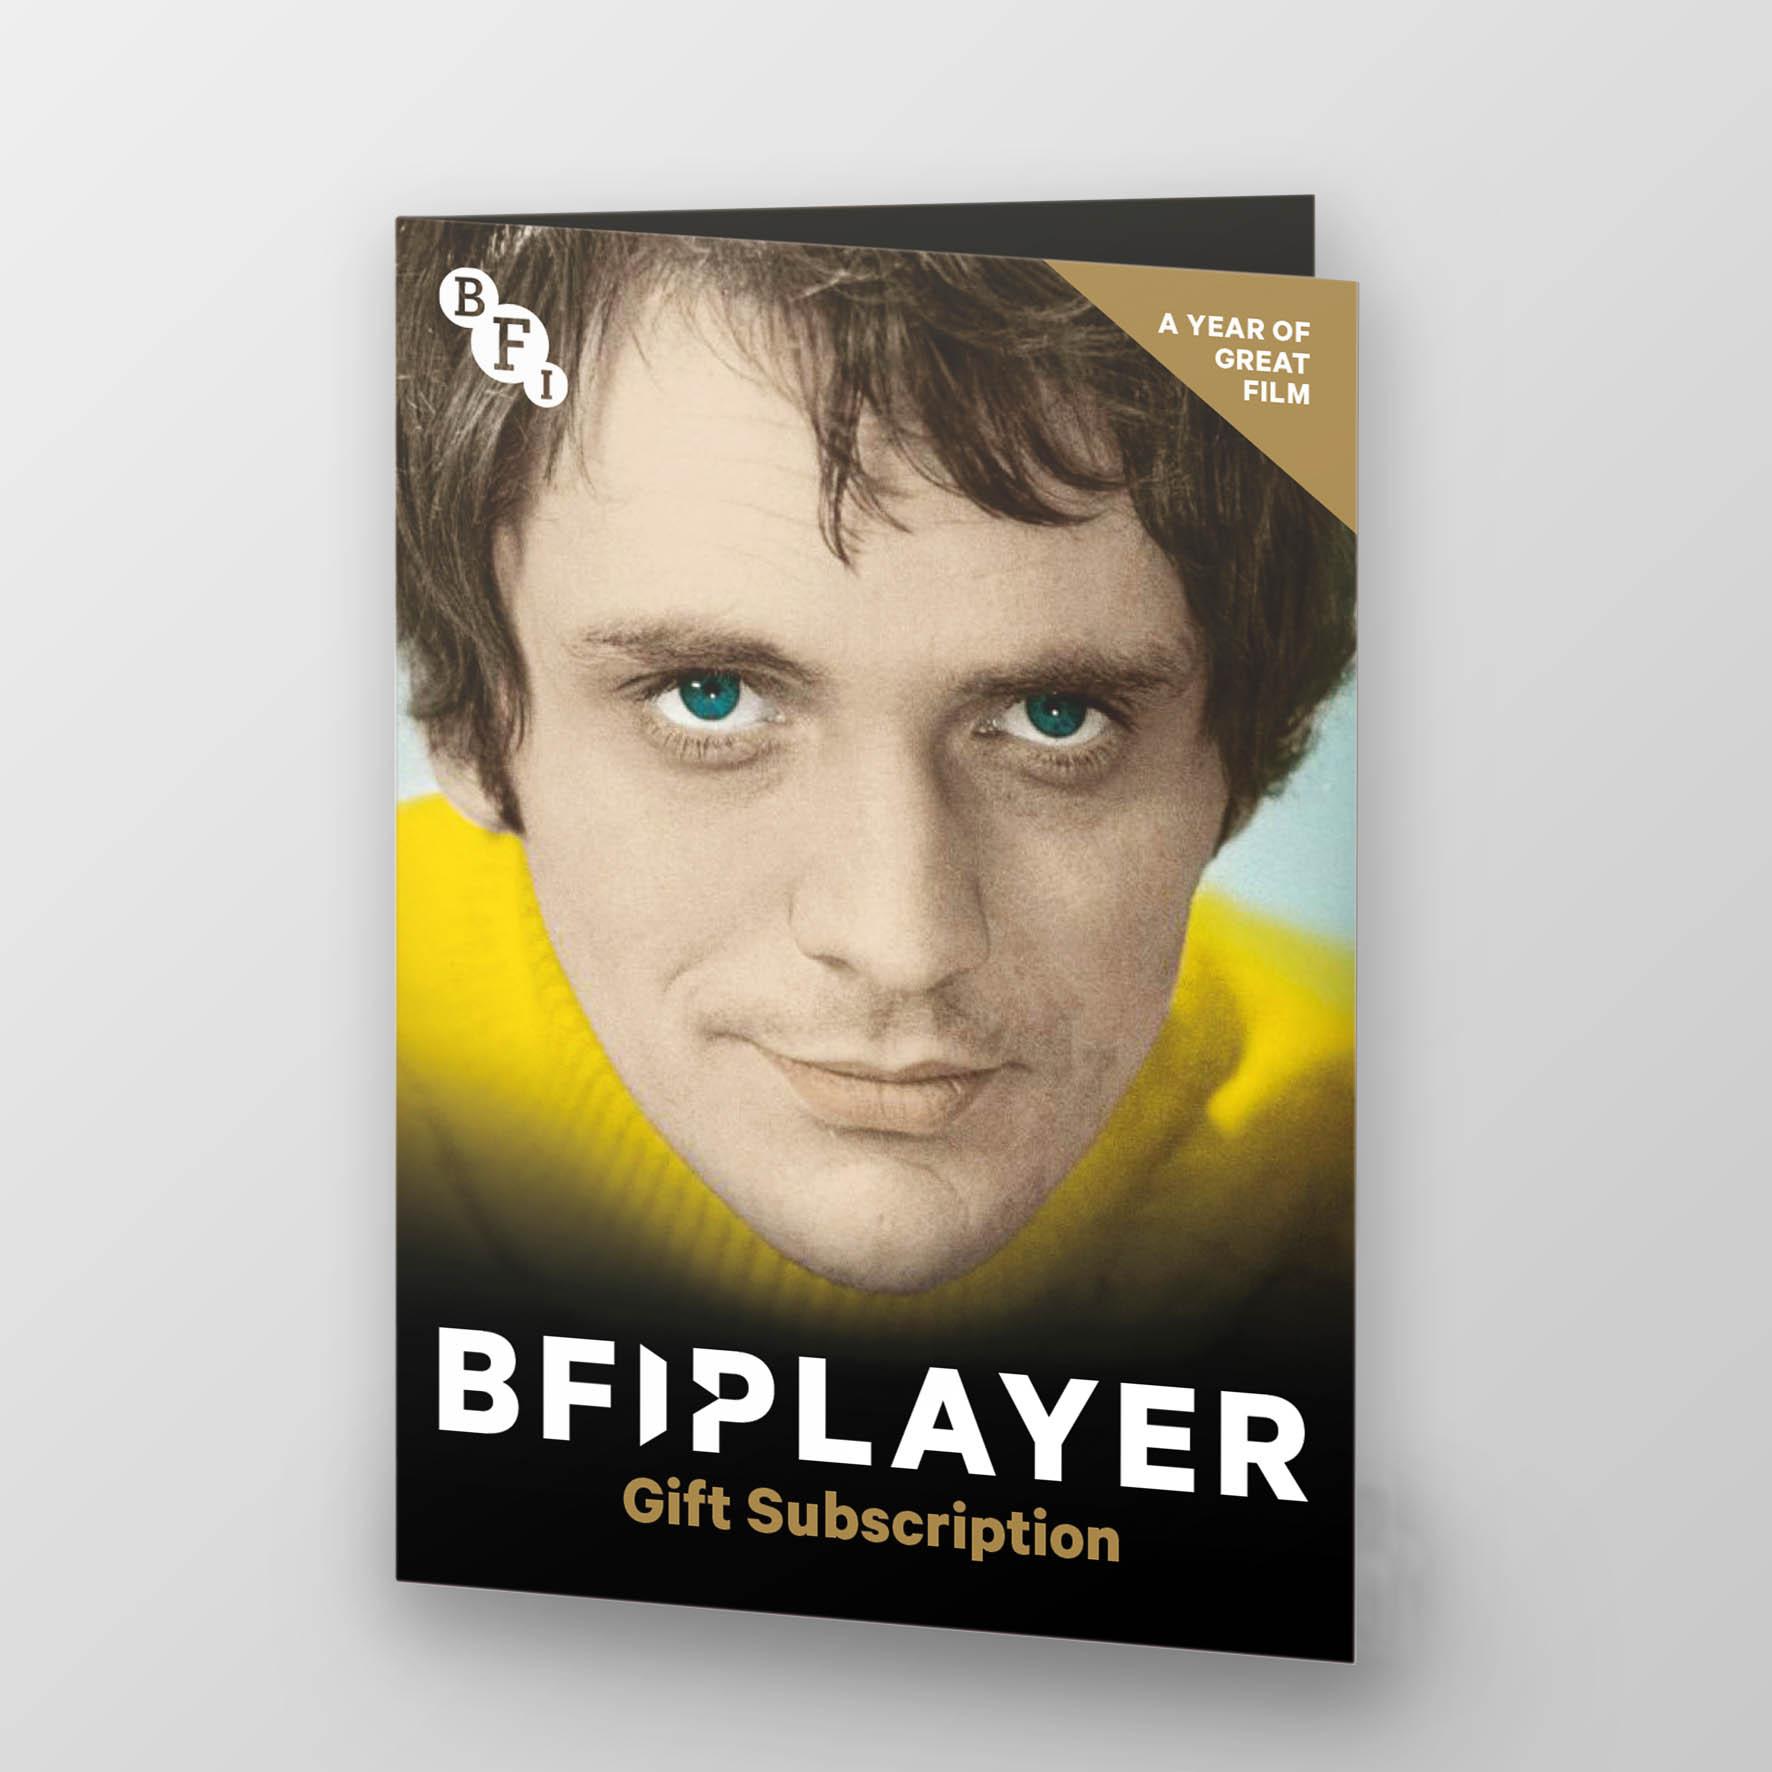 Buy BFI Player Gift Subscription (Theorem design)